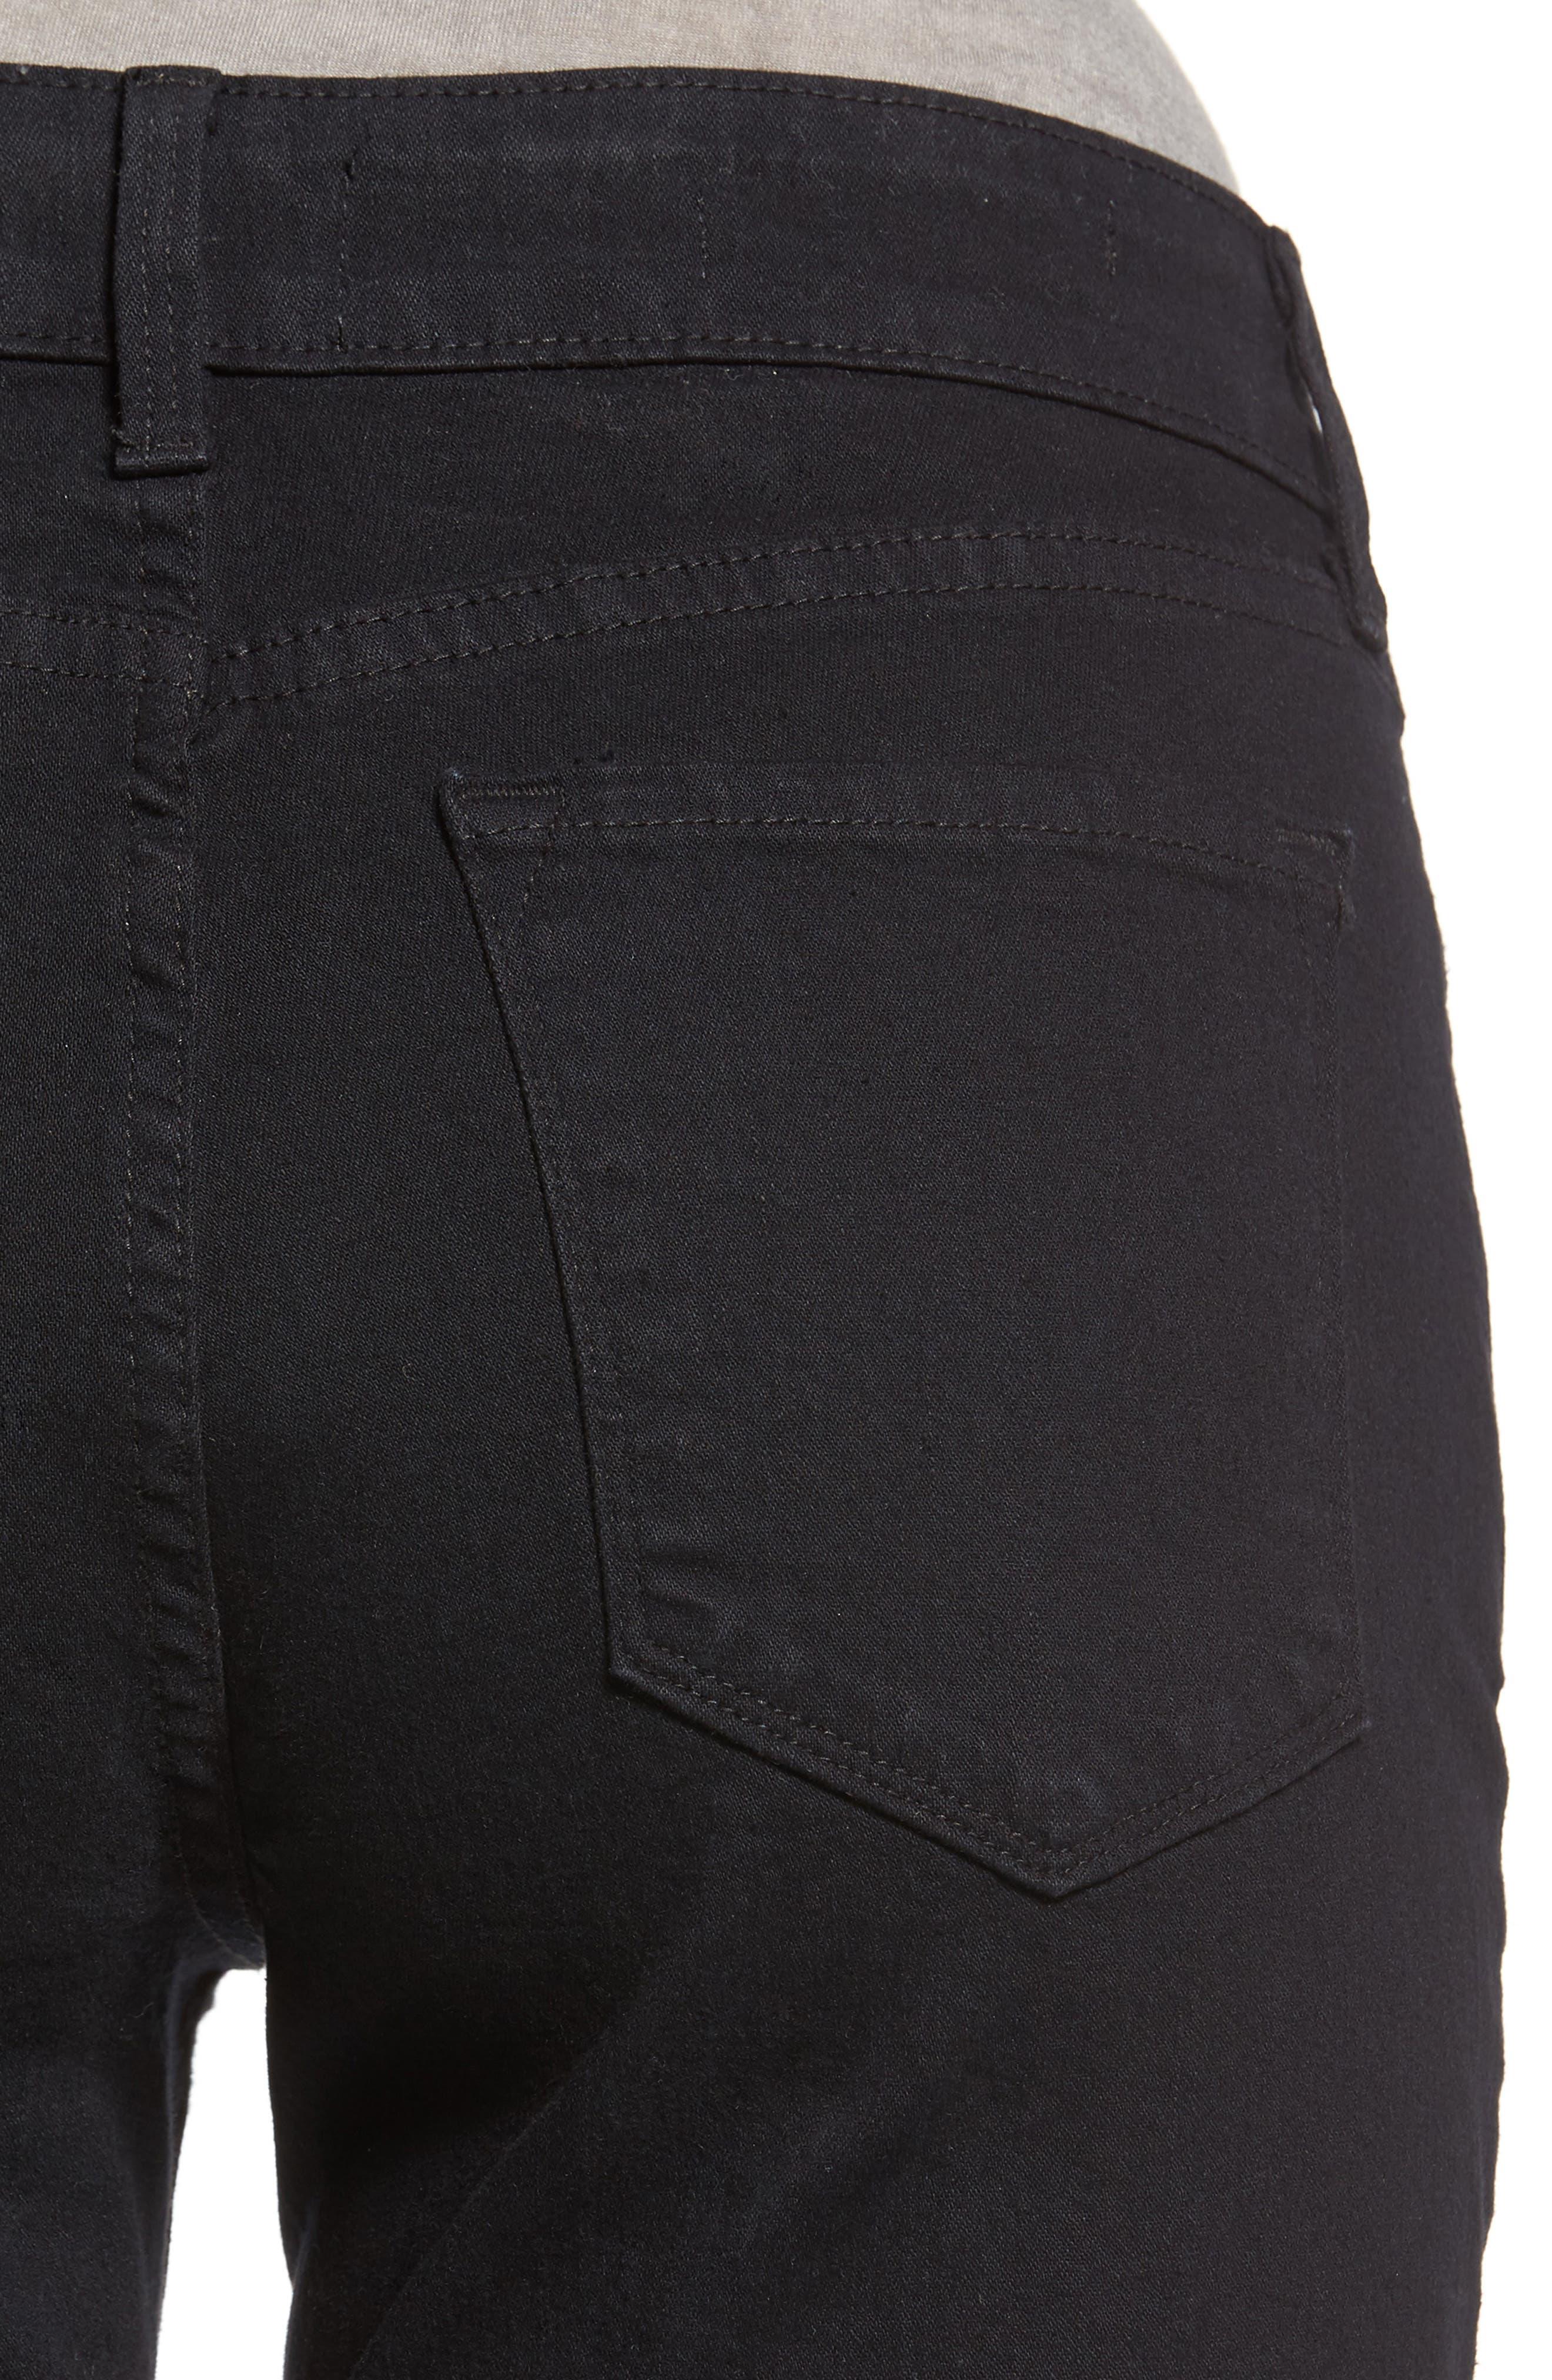 Marilyn Stretch Straight Leg Jeans,                             Alternate thumbnail 4, color,                             Black